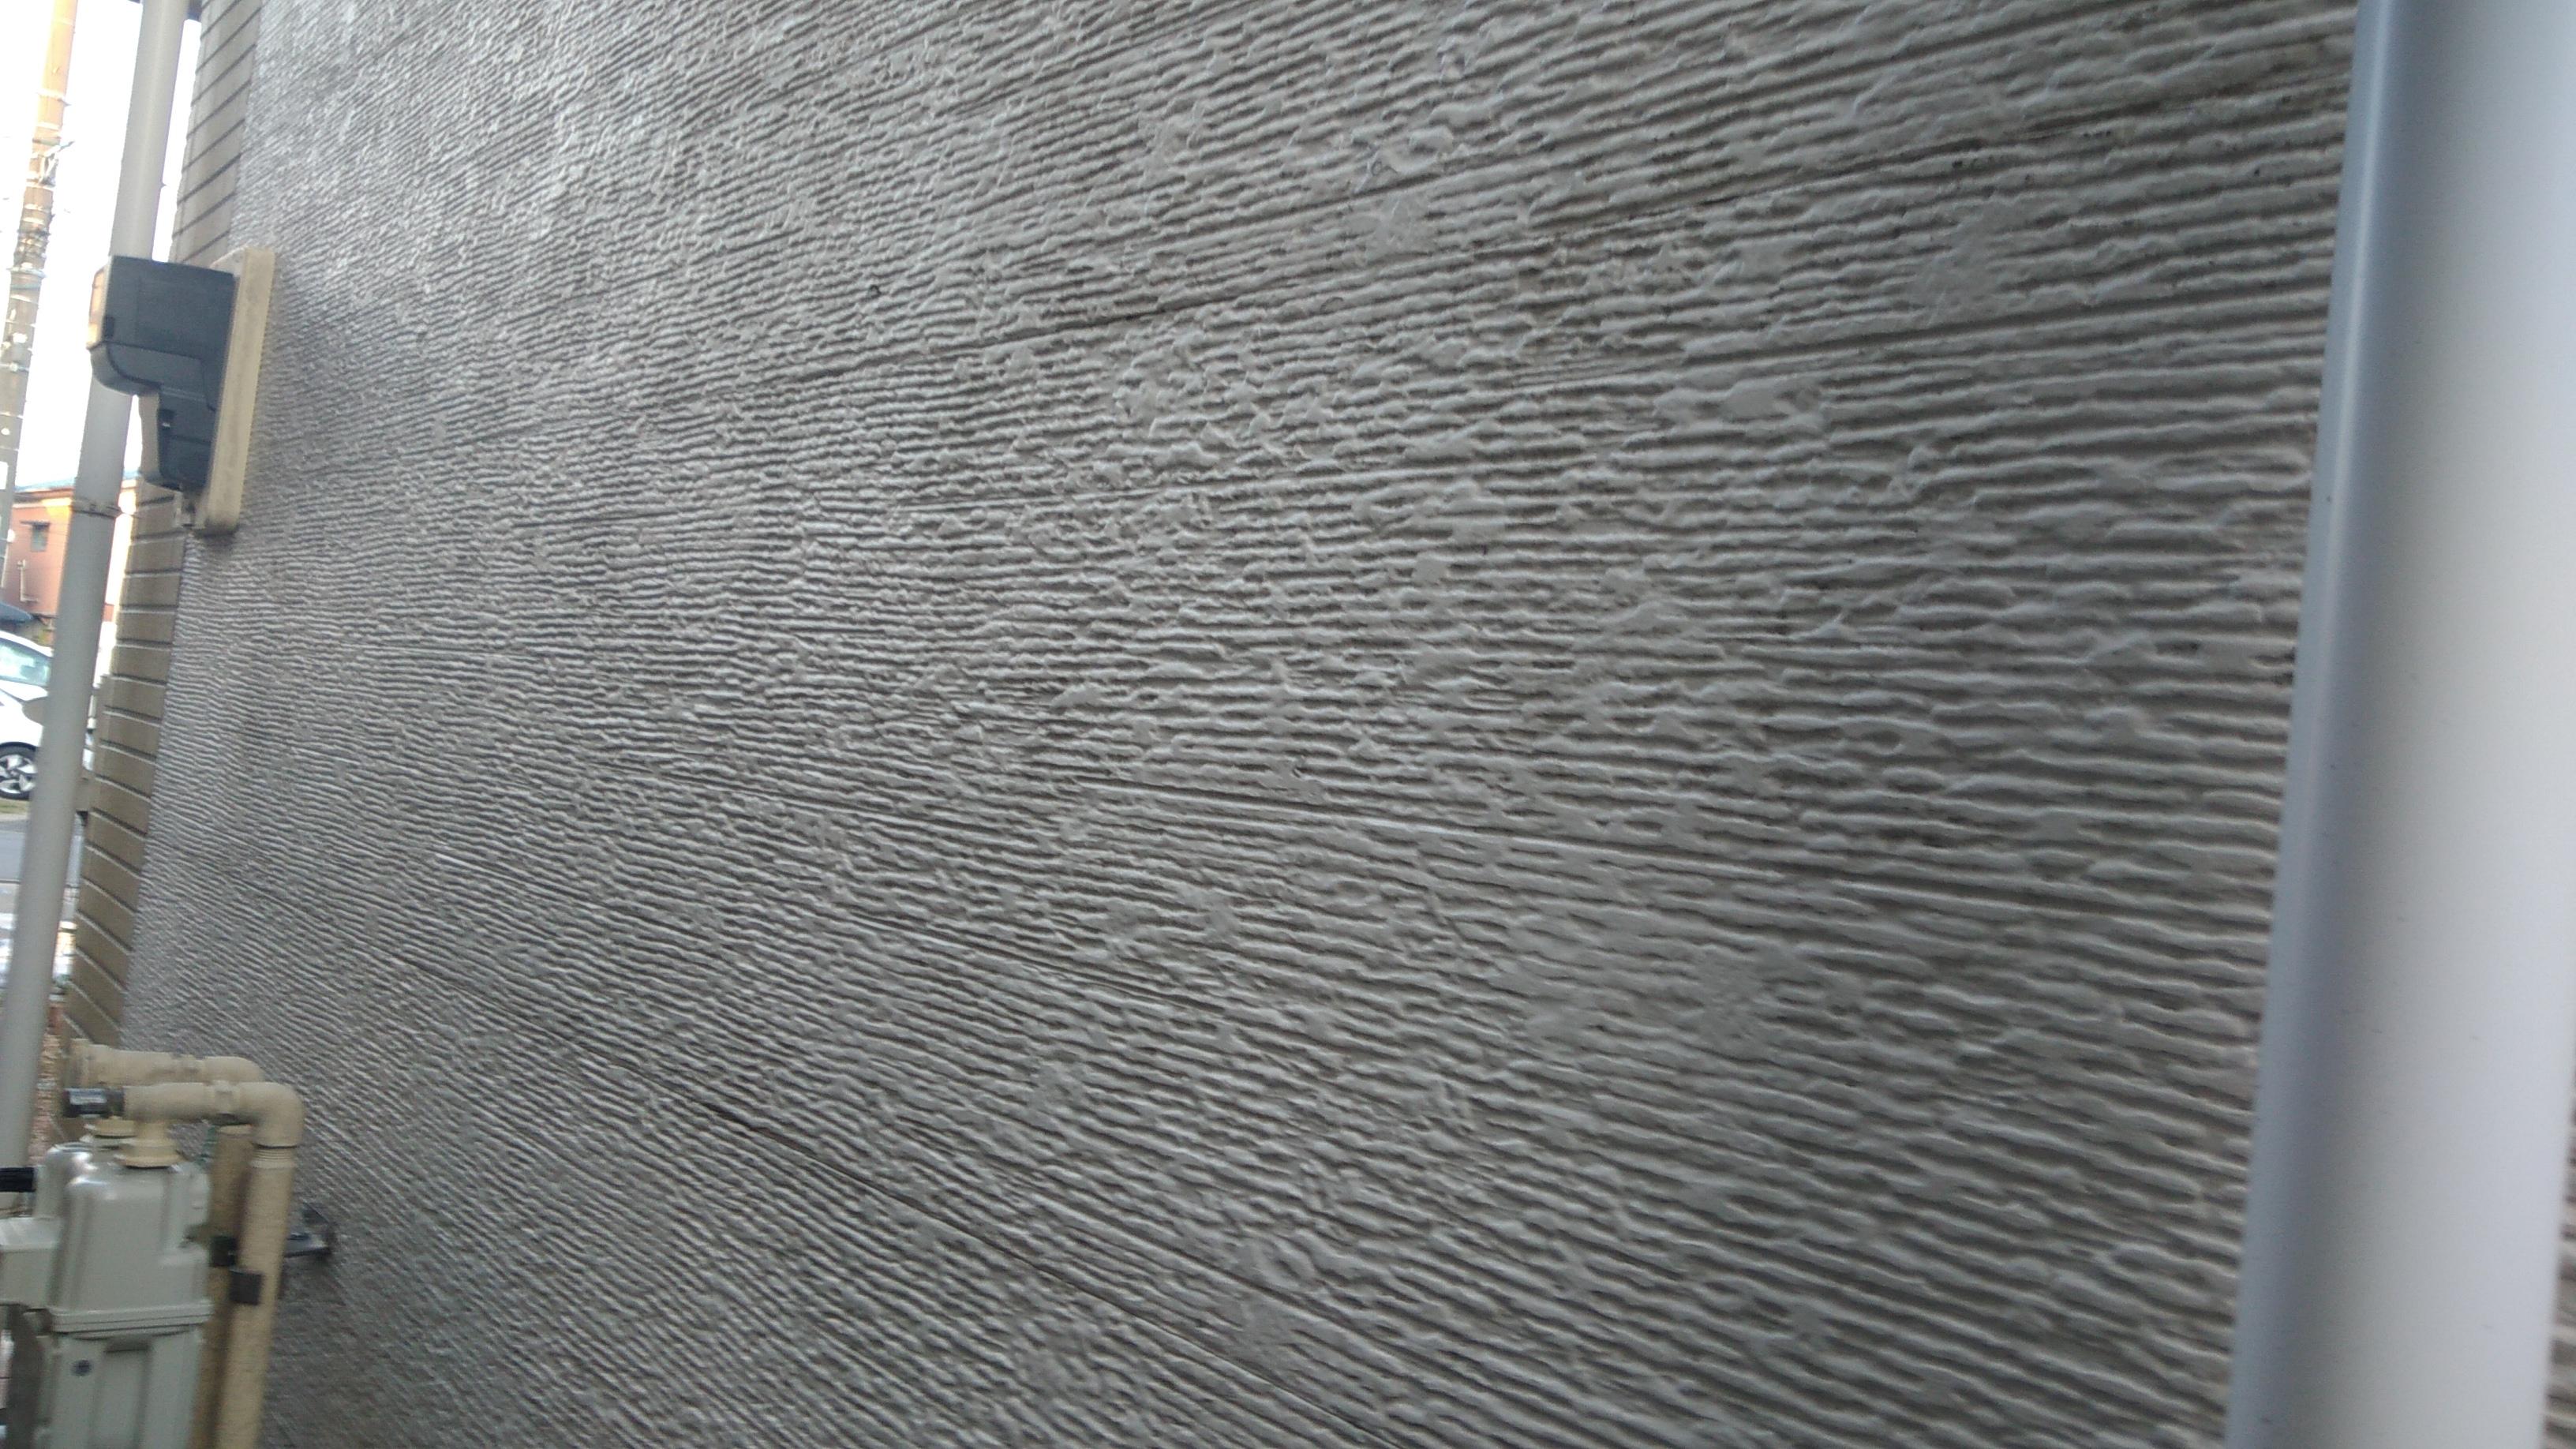 bf9d8f7aaa0cf2778675ada83e5b4edb - 家の外壁のコケ(苔)取り・藻の除去の方法徹底調査で最安の方法コレ